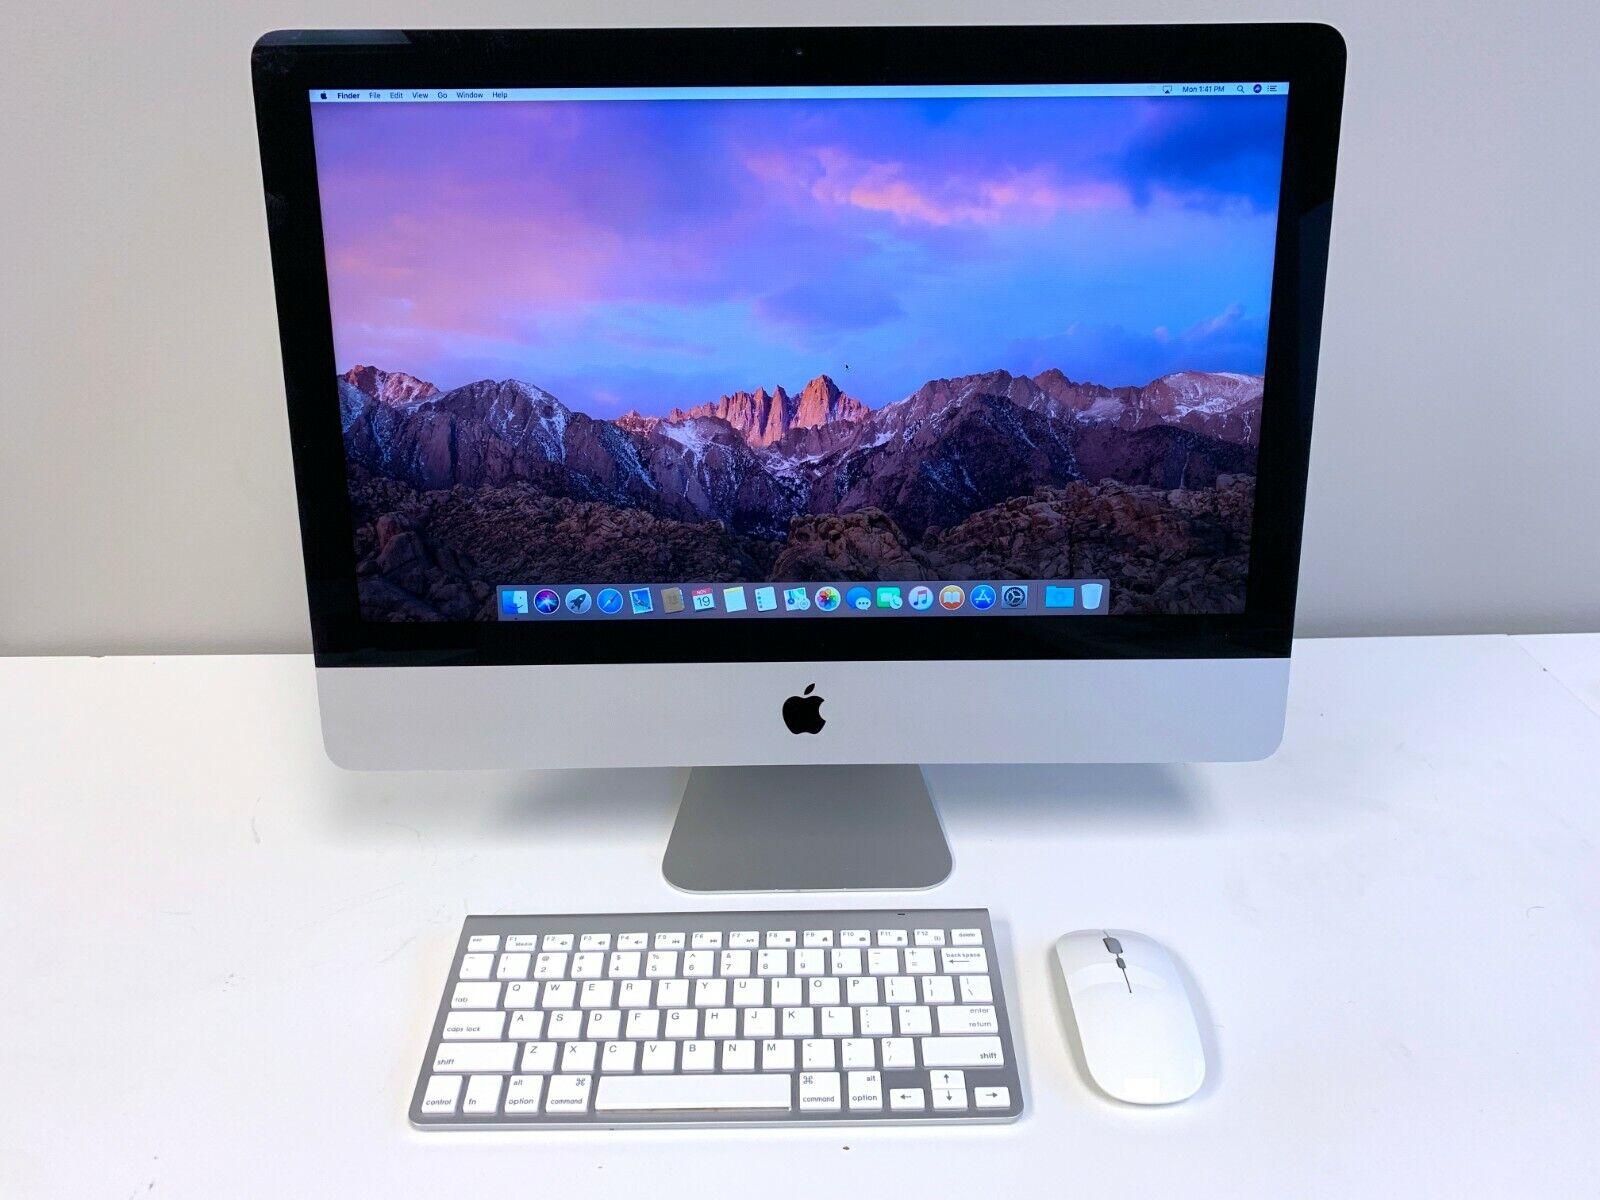 Apple iMac 21.5 inch SLIM / QUAD CORE i7 3.9GHZ / 1TB / 16GB RAM / OSX-2019. Buy it now for 799.00